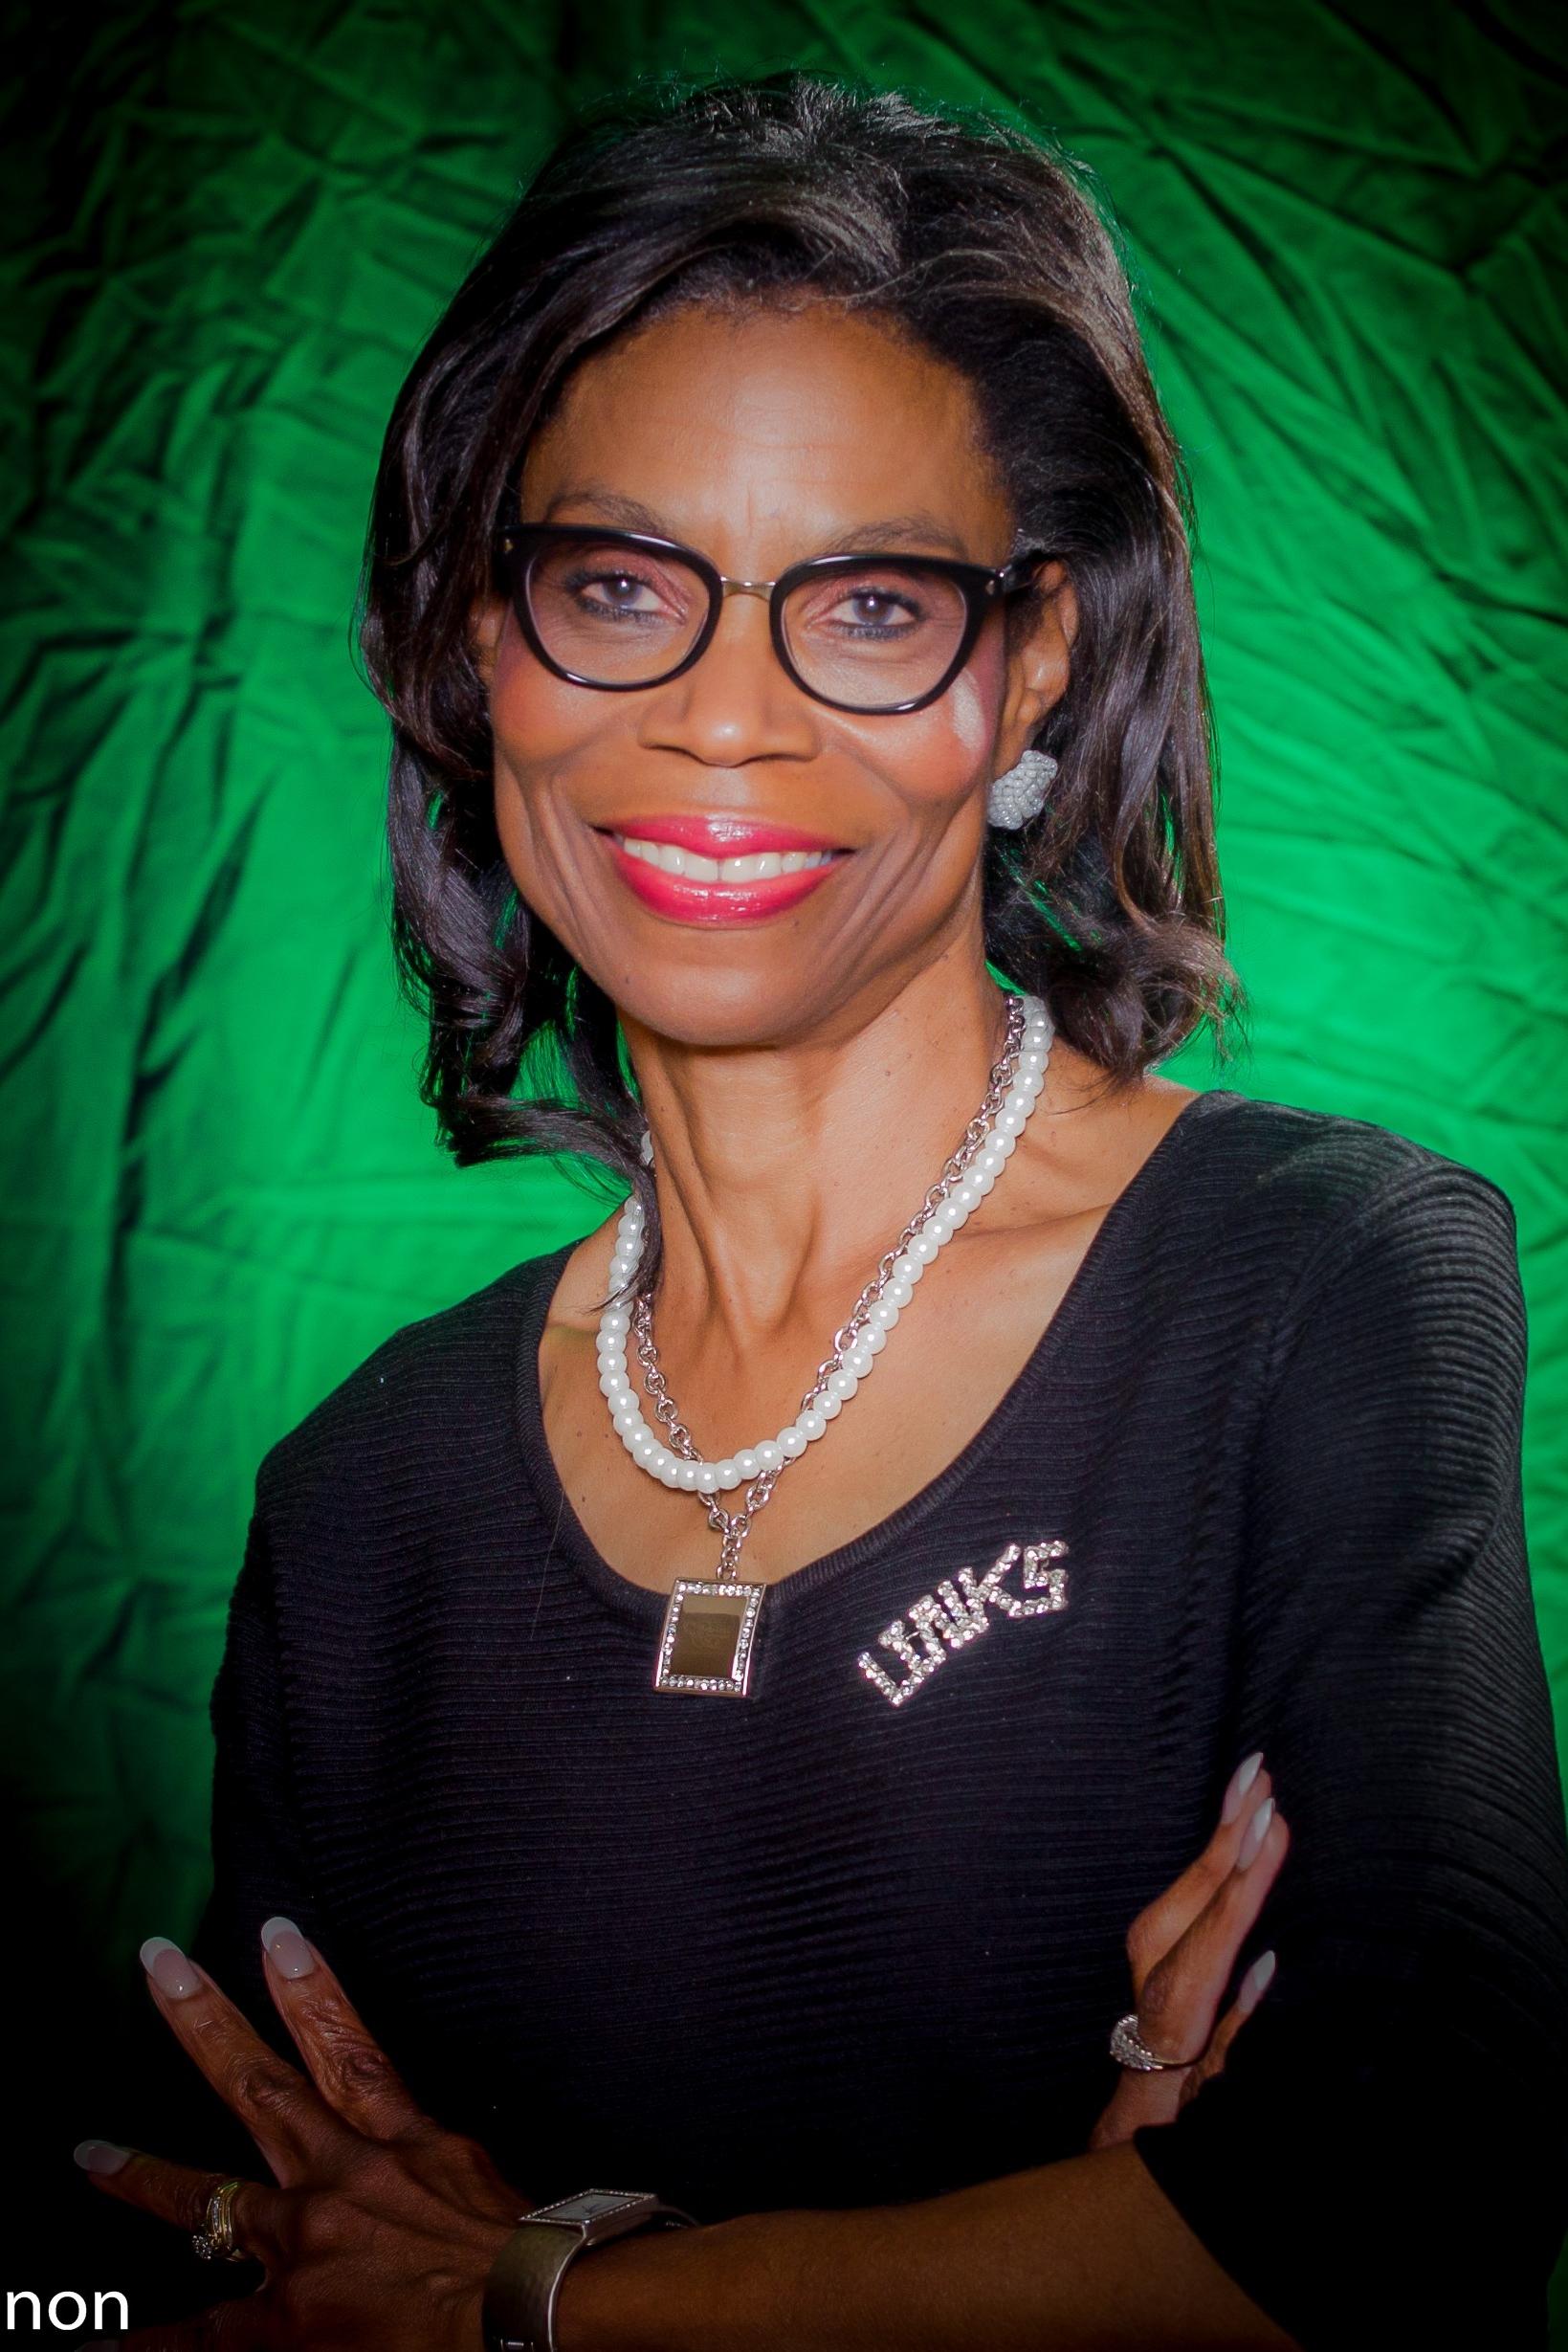 Glenda Kearney DuBoise